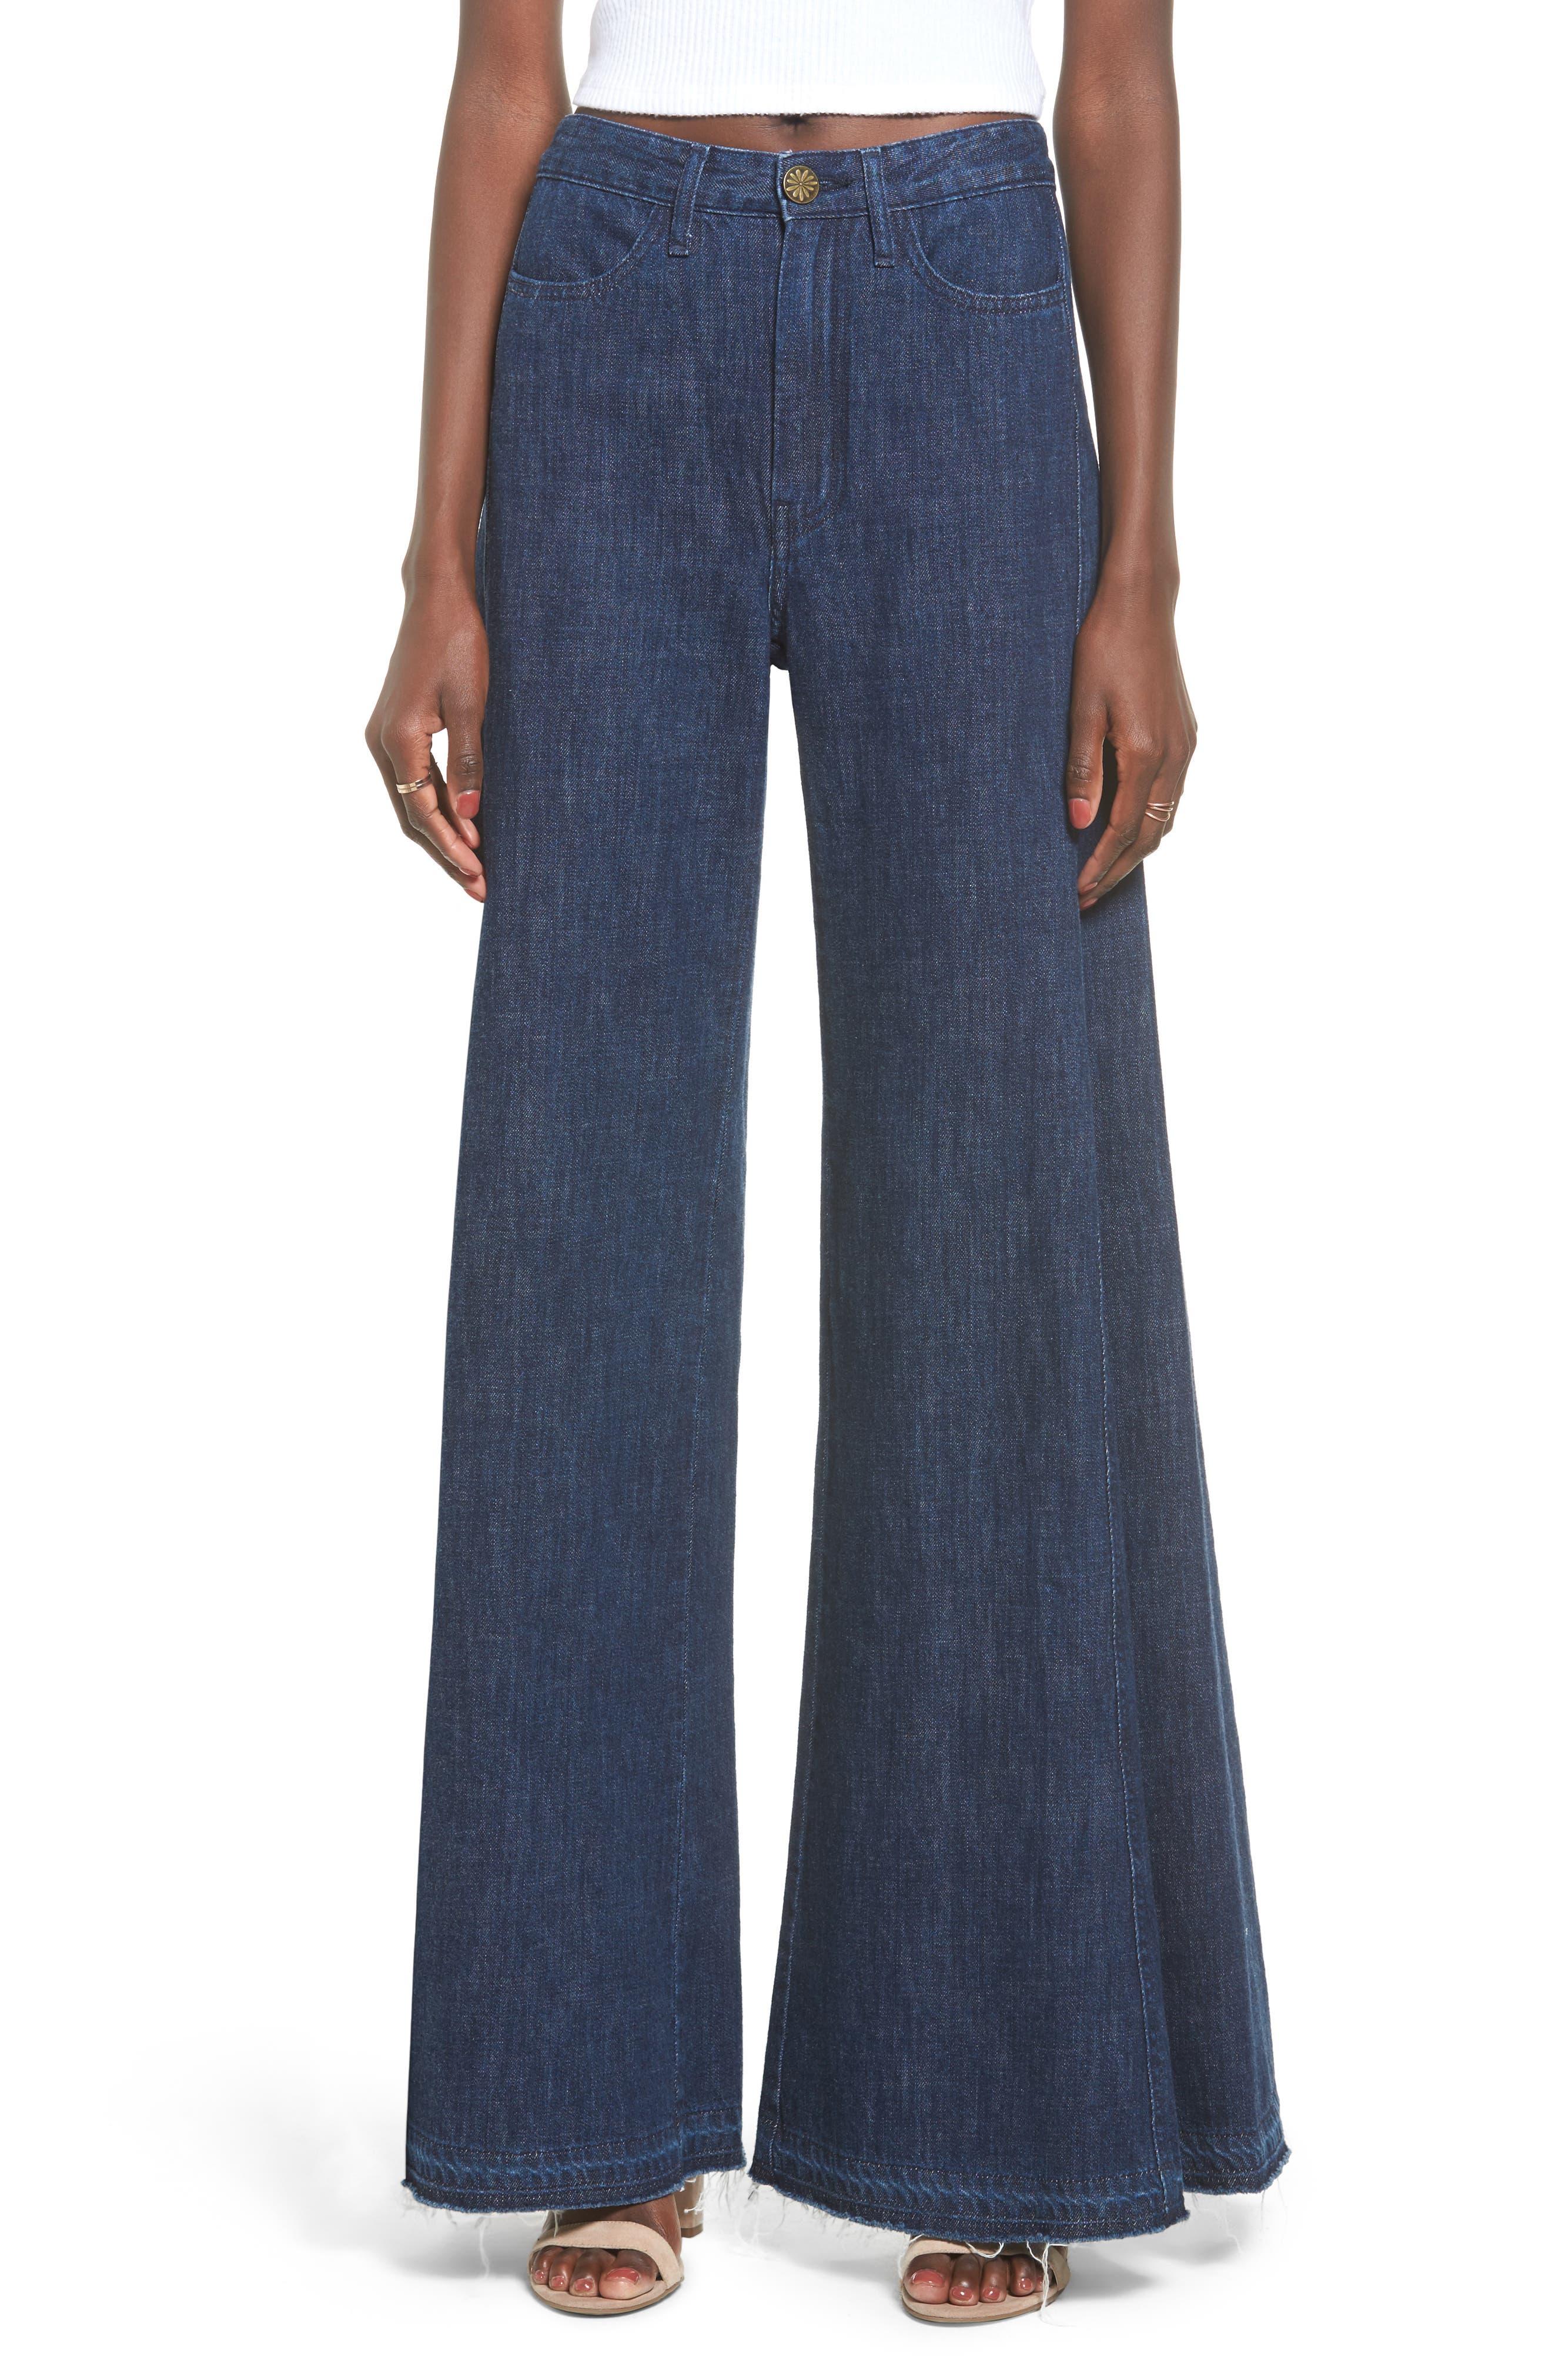 San Fran Super Flare Denim Pants,                             Main thumbnail 1, color,                             400